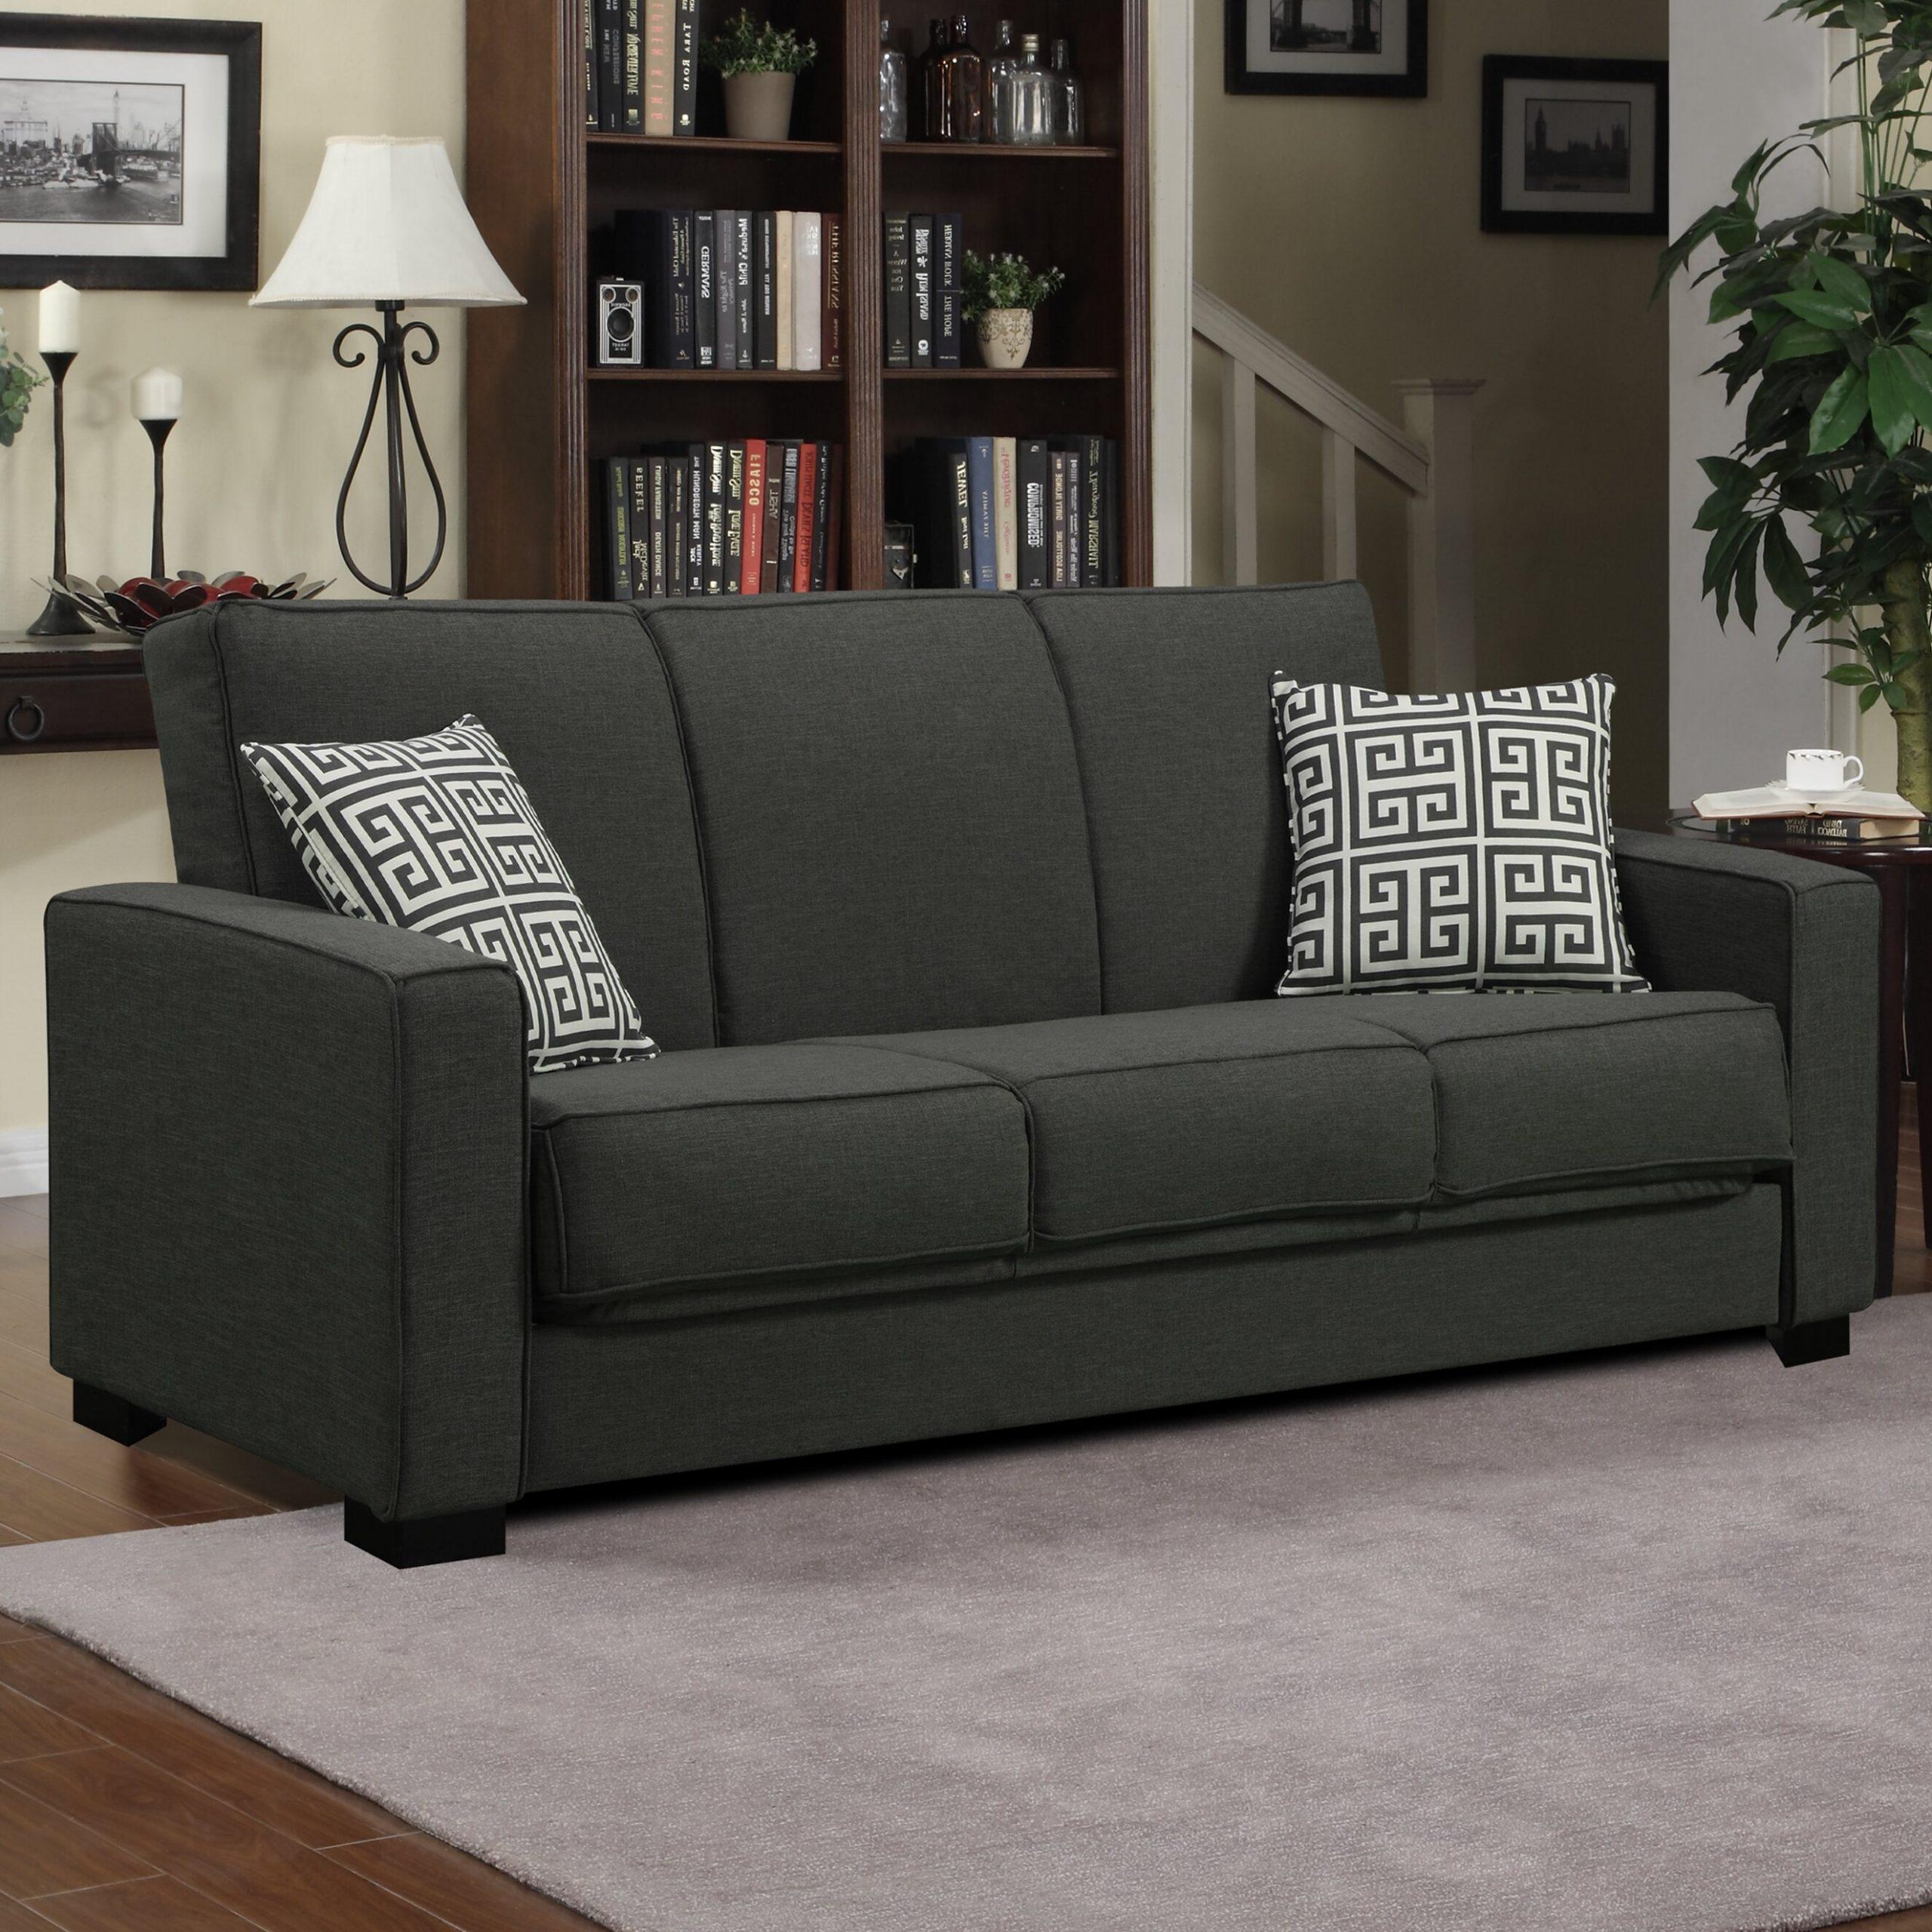 Mercury Row Athena Convertible Sleeper Sofa & Reviews With Regard To Convertible Sectional Sofas (View 9 of 15)